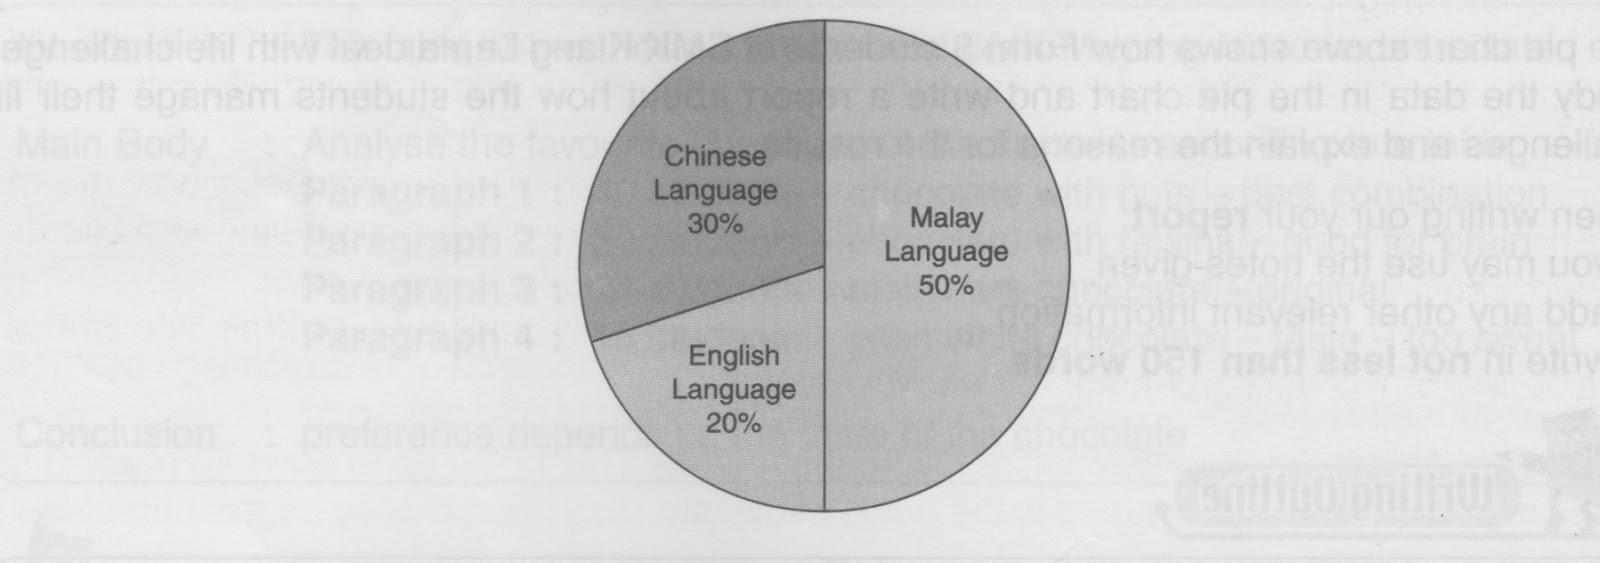 Learning english daily pt3 guided writing pie chart bar graph medium of communication among employees of abc sdn bhd nvjuhfo Choice Image